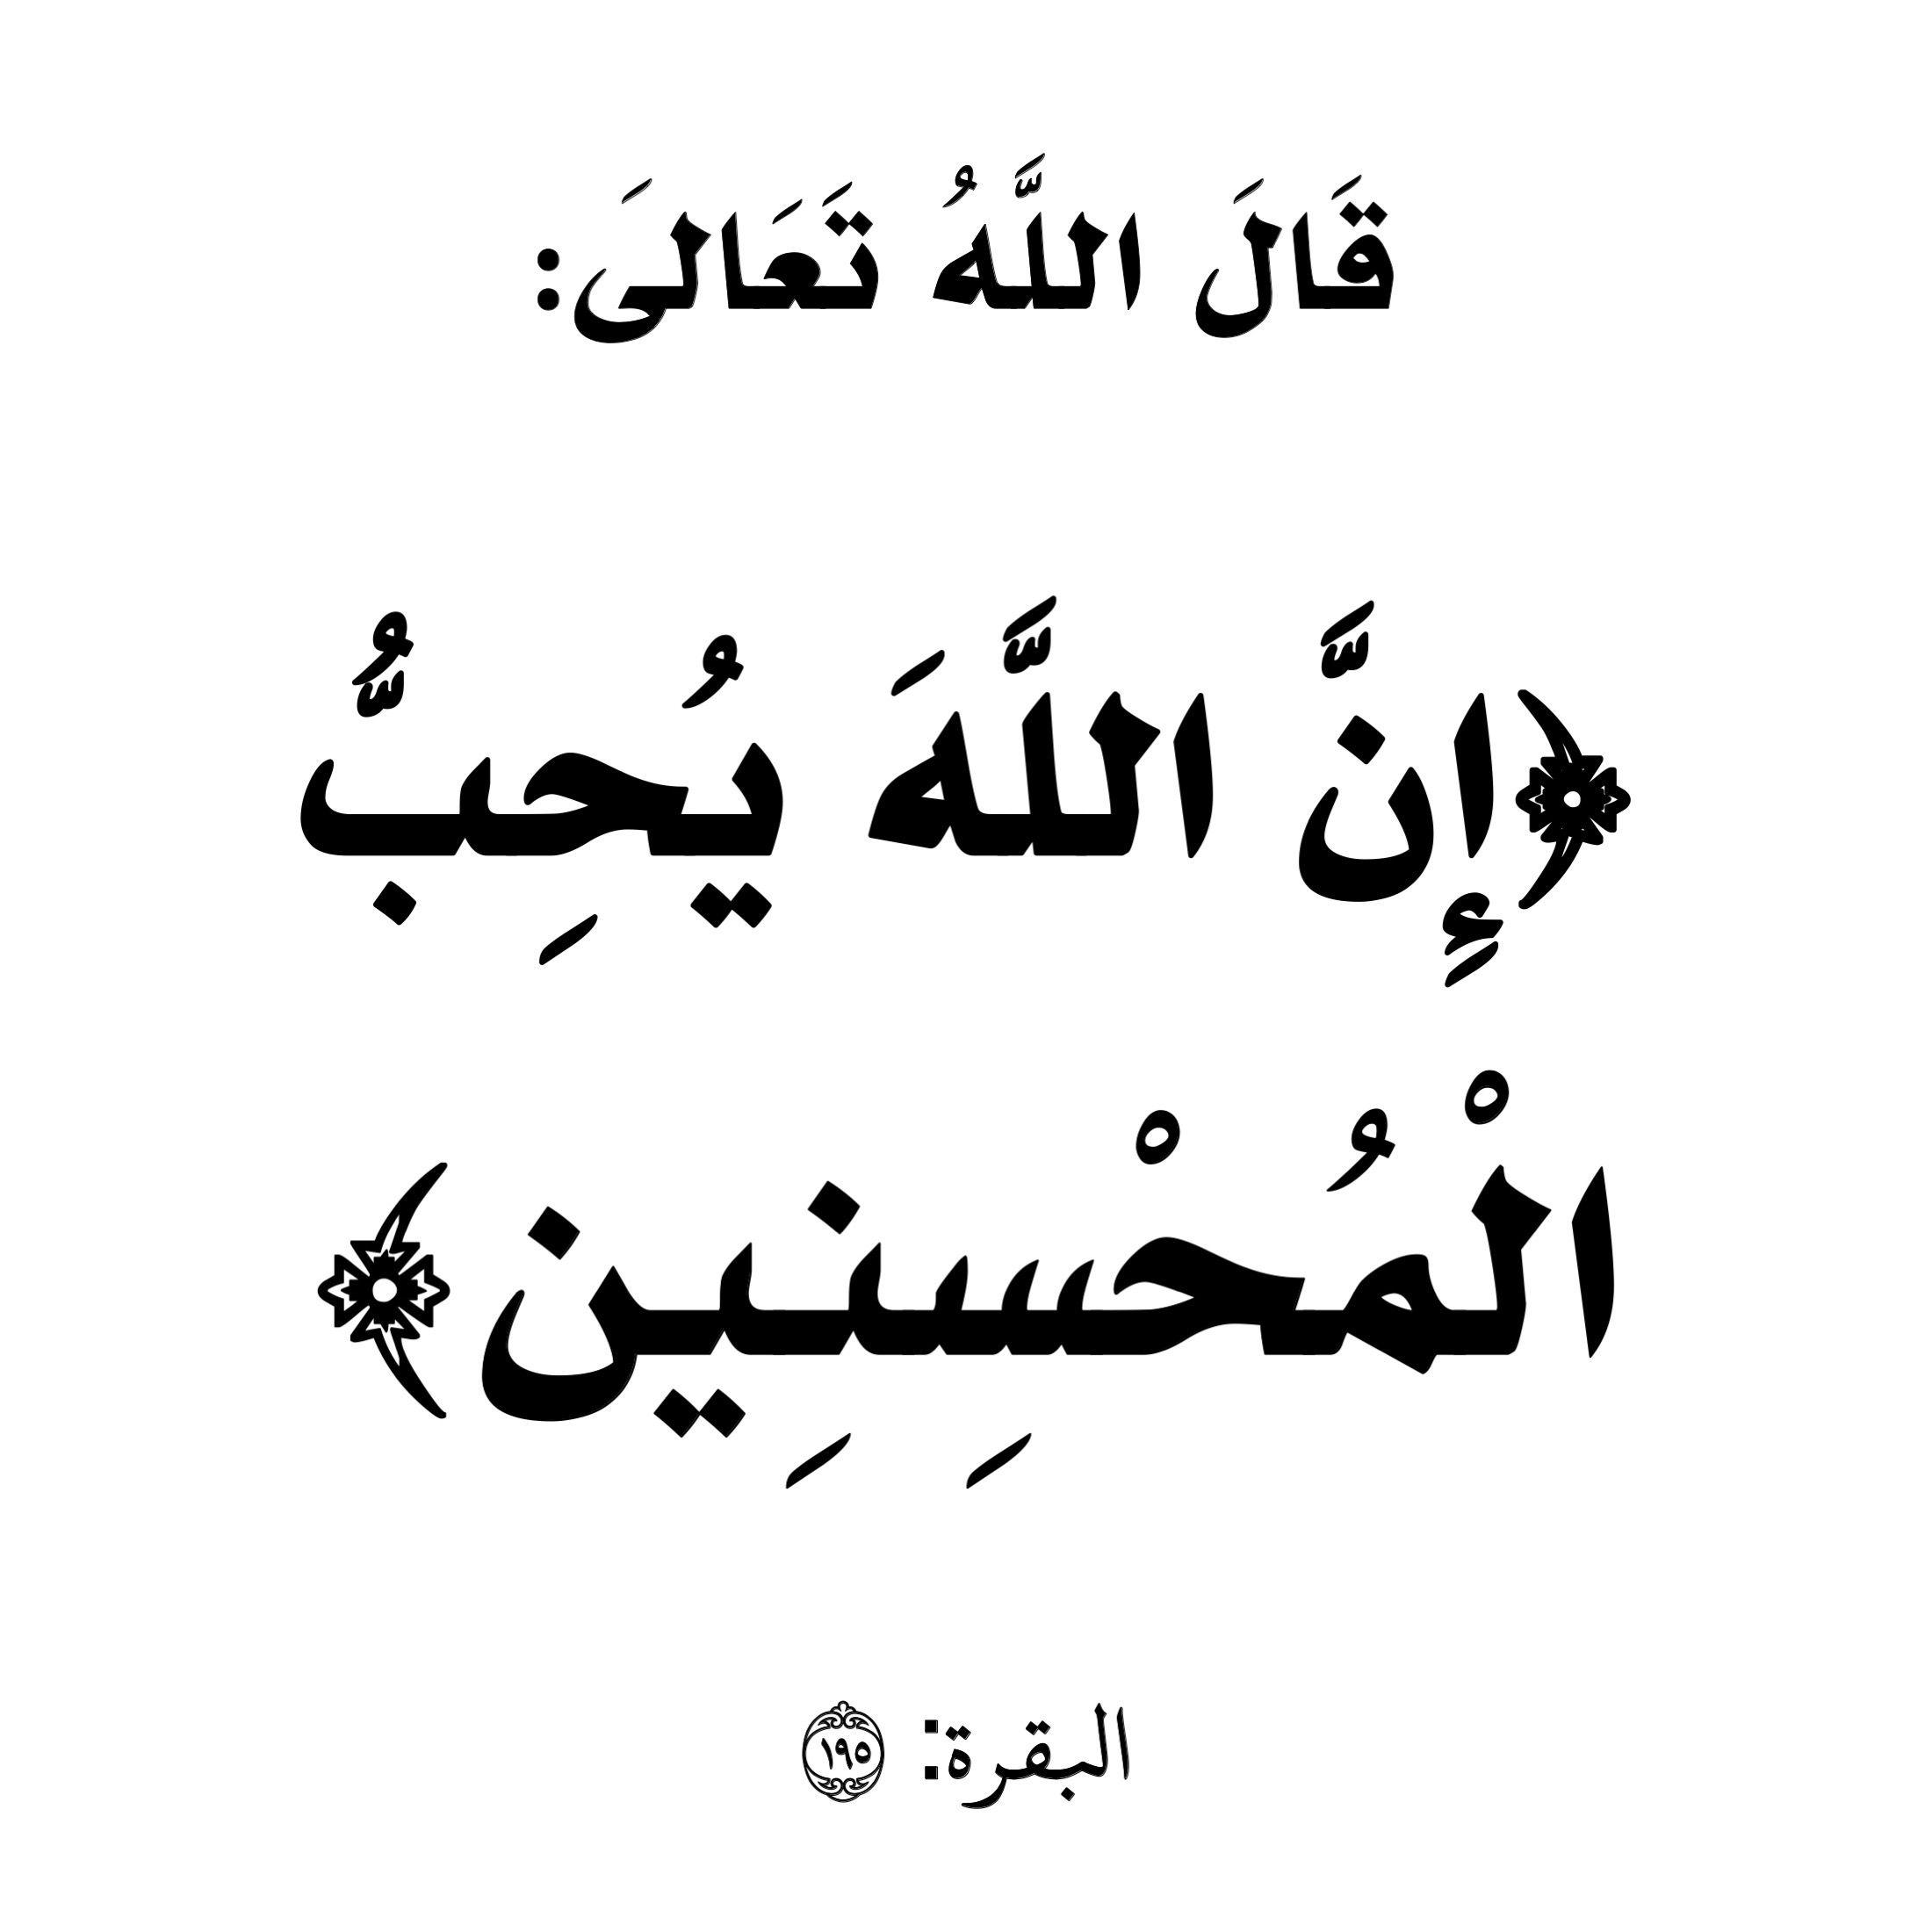 Pin by الأثر الجميل on آيات من القرآن الكريم in 2020